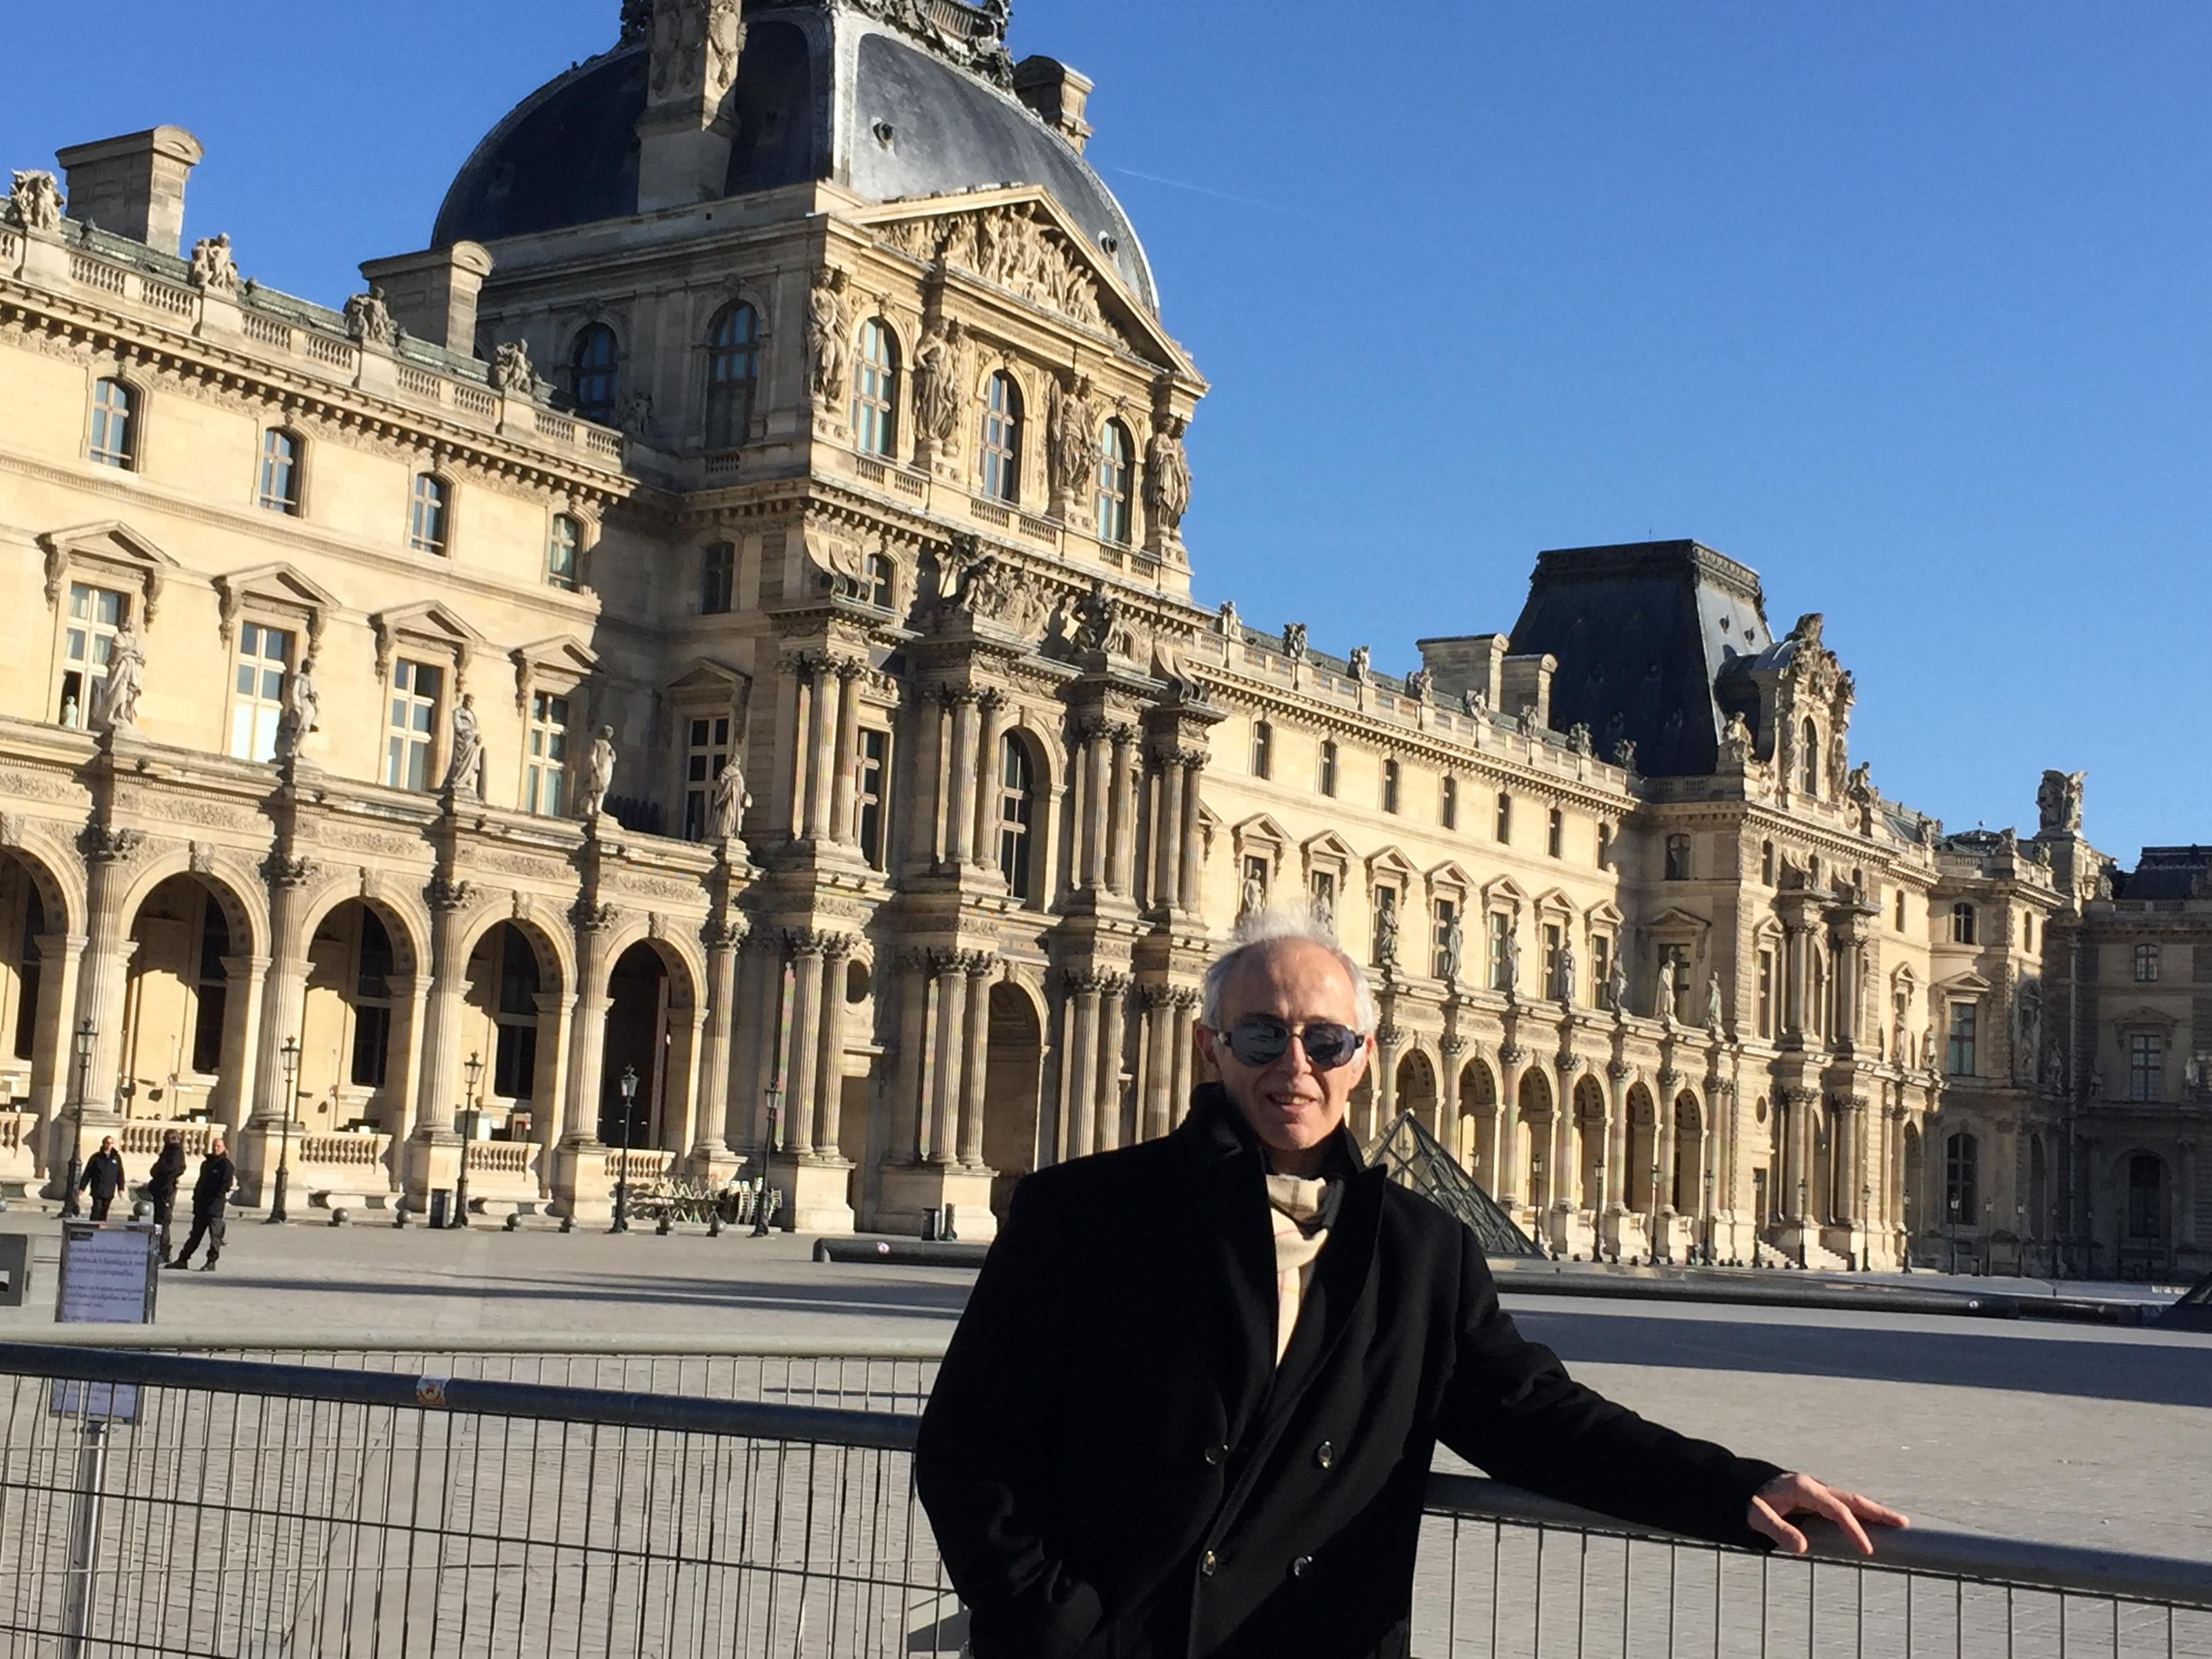 Massimo Sargiacomo - November 2015, Nantes: Accounting And The Government Of The Agricultural Economy: Arrigo Serpieri And The Reclamation Consortia